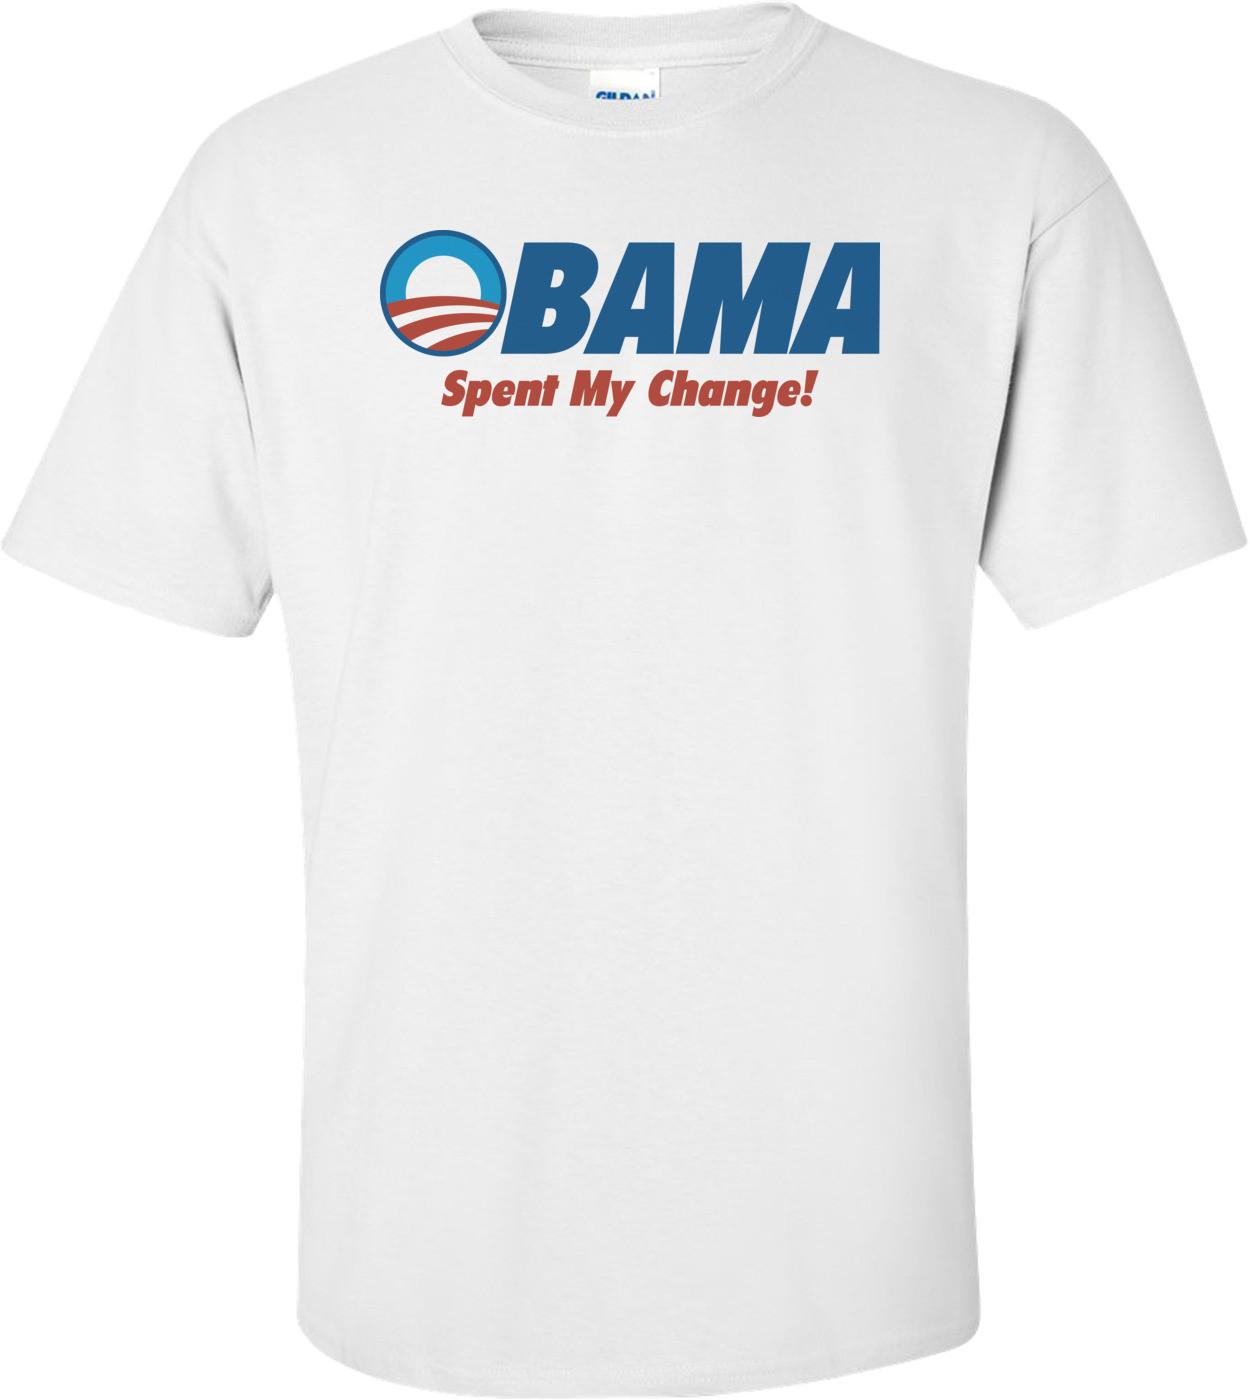 Obama Spent My Change Anti-obama T-shirt